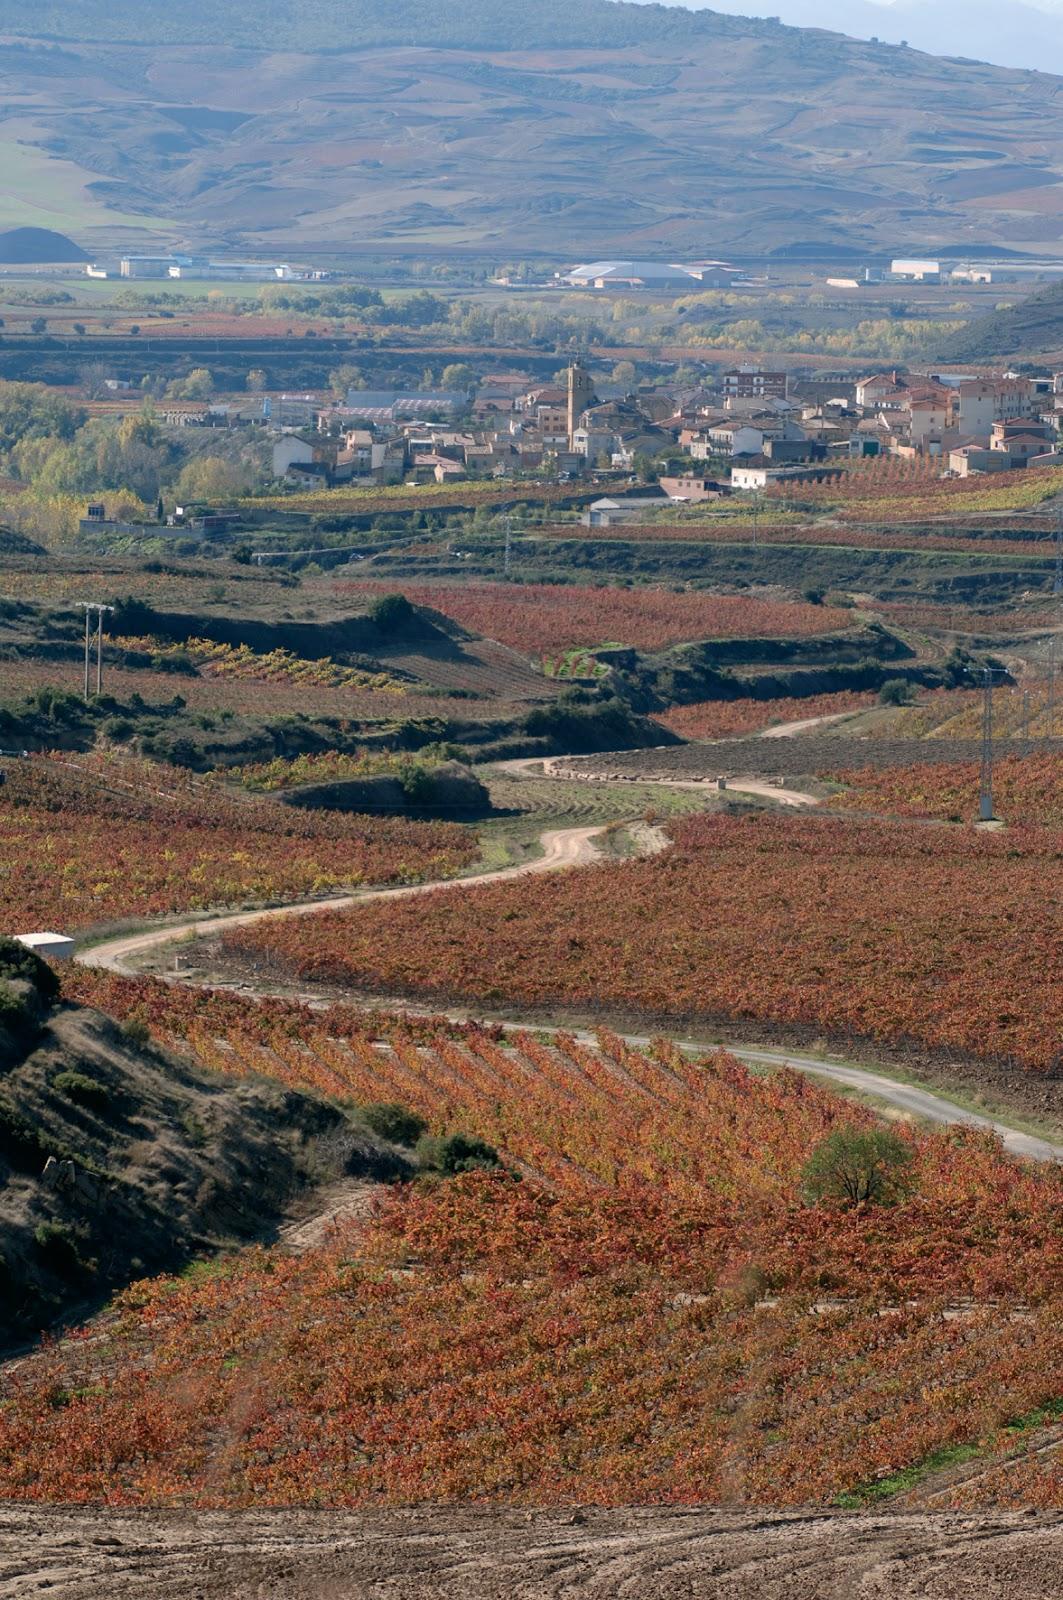 La Ruta del Vino de Rioja Alavesa se suma a la celebración